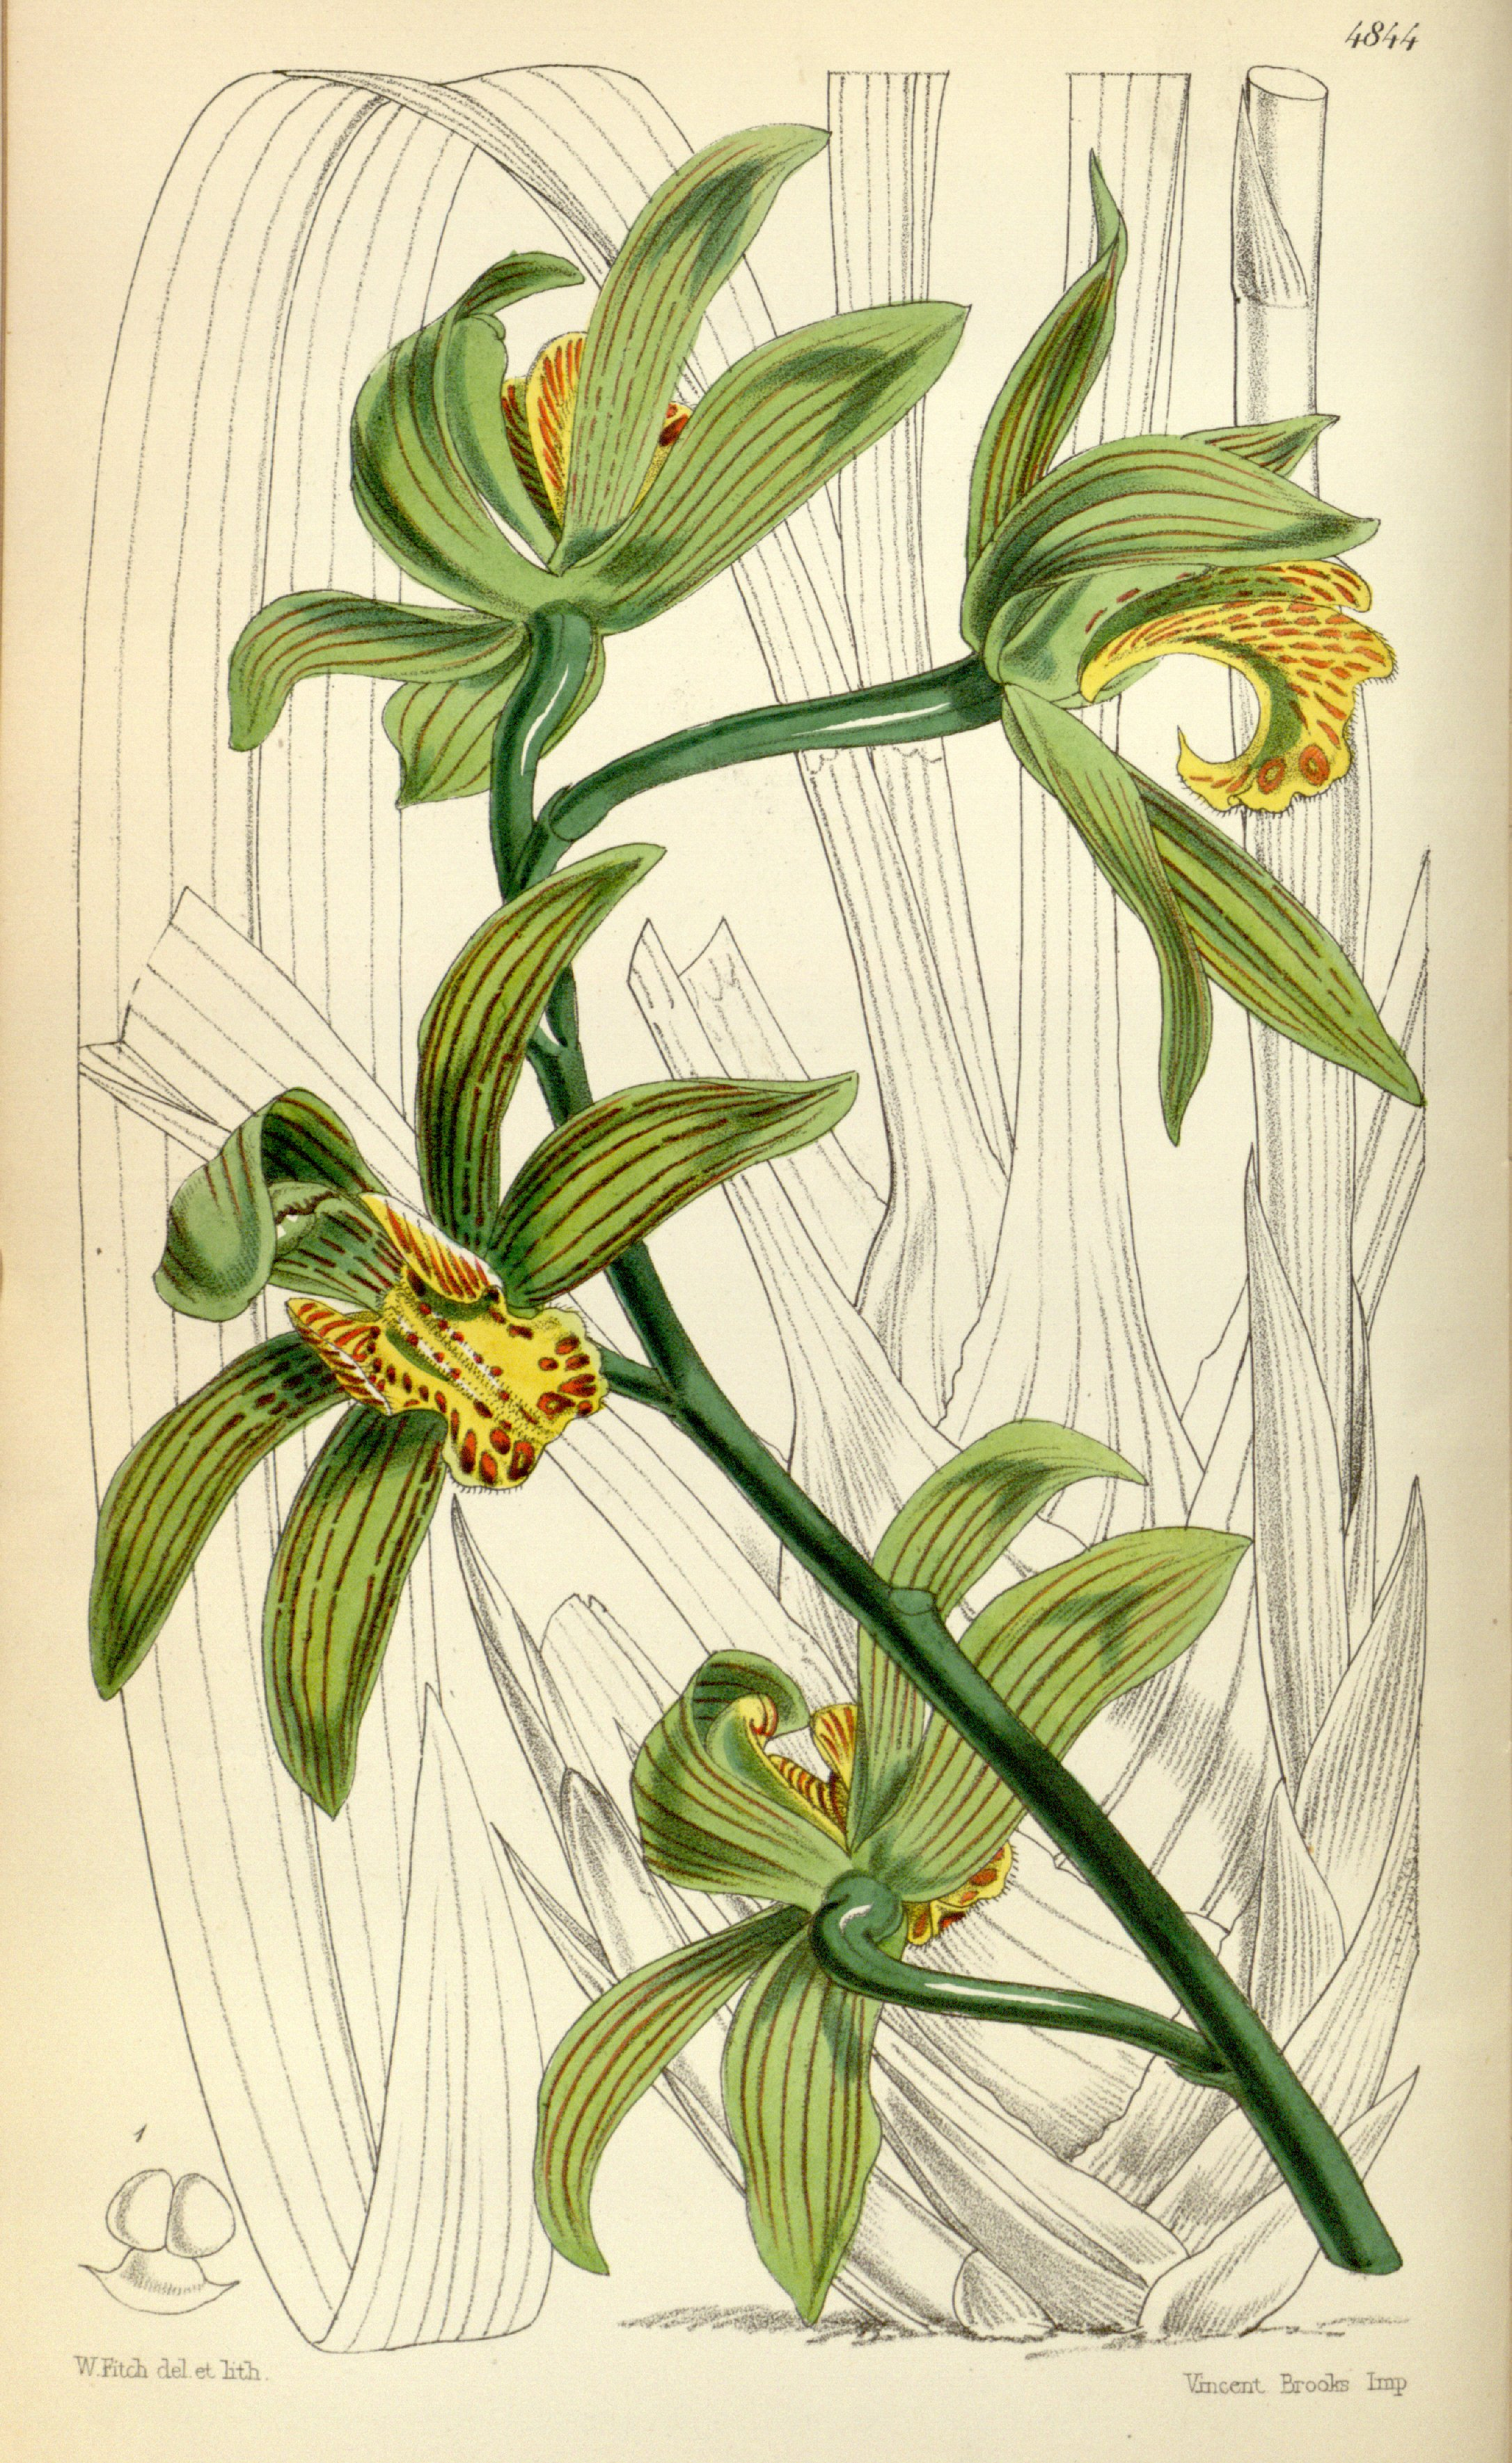 Cymbidium_iridioides_(as_Cymbidium_giganteum_Wall._ex_Lindl.)_-_Curtis'_81_(Ser._3_no._11)_pl._4844_(1855)